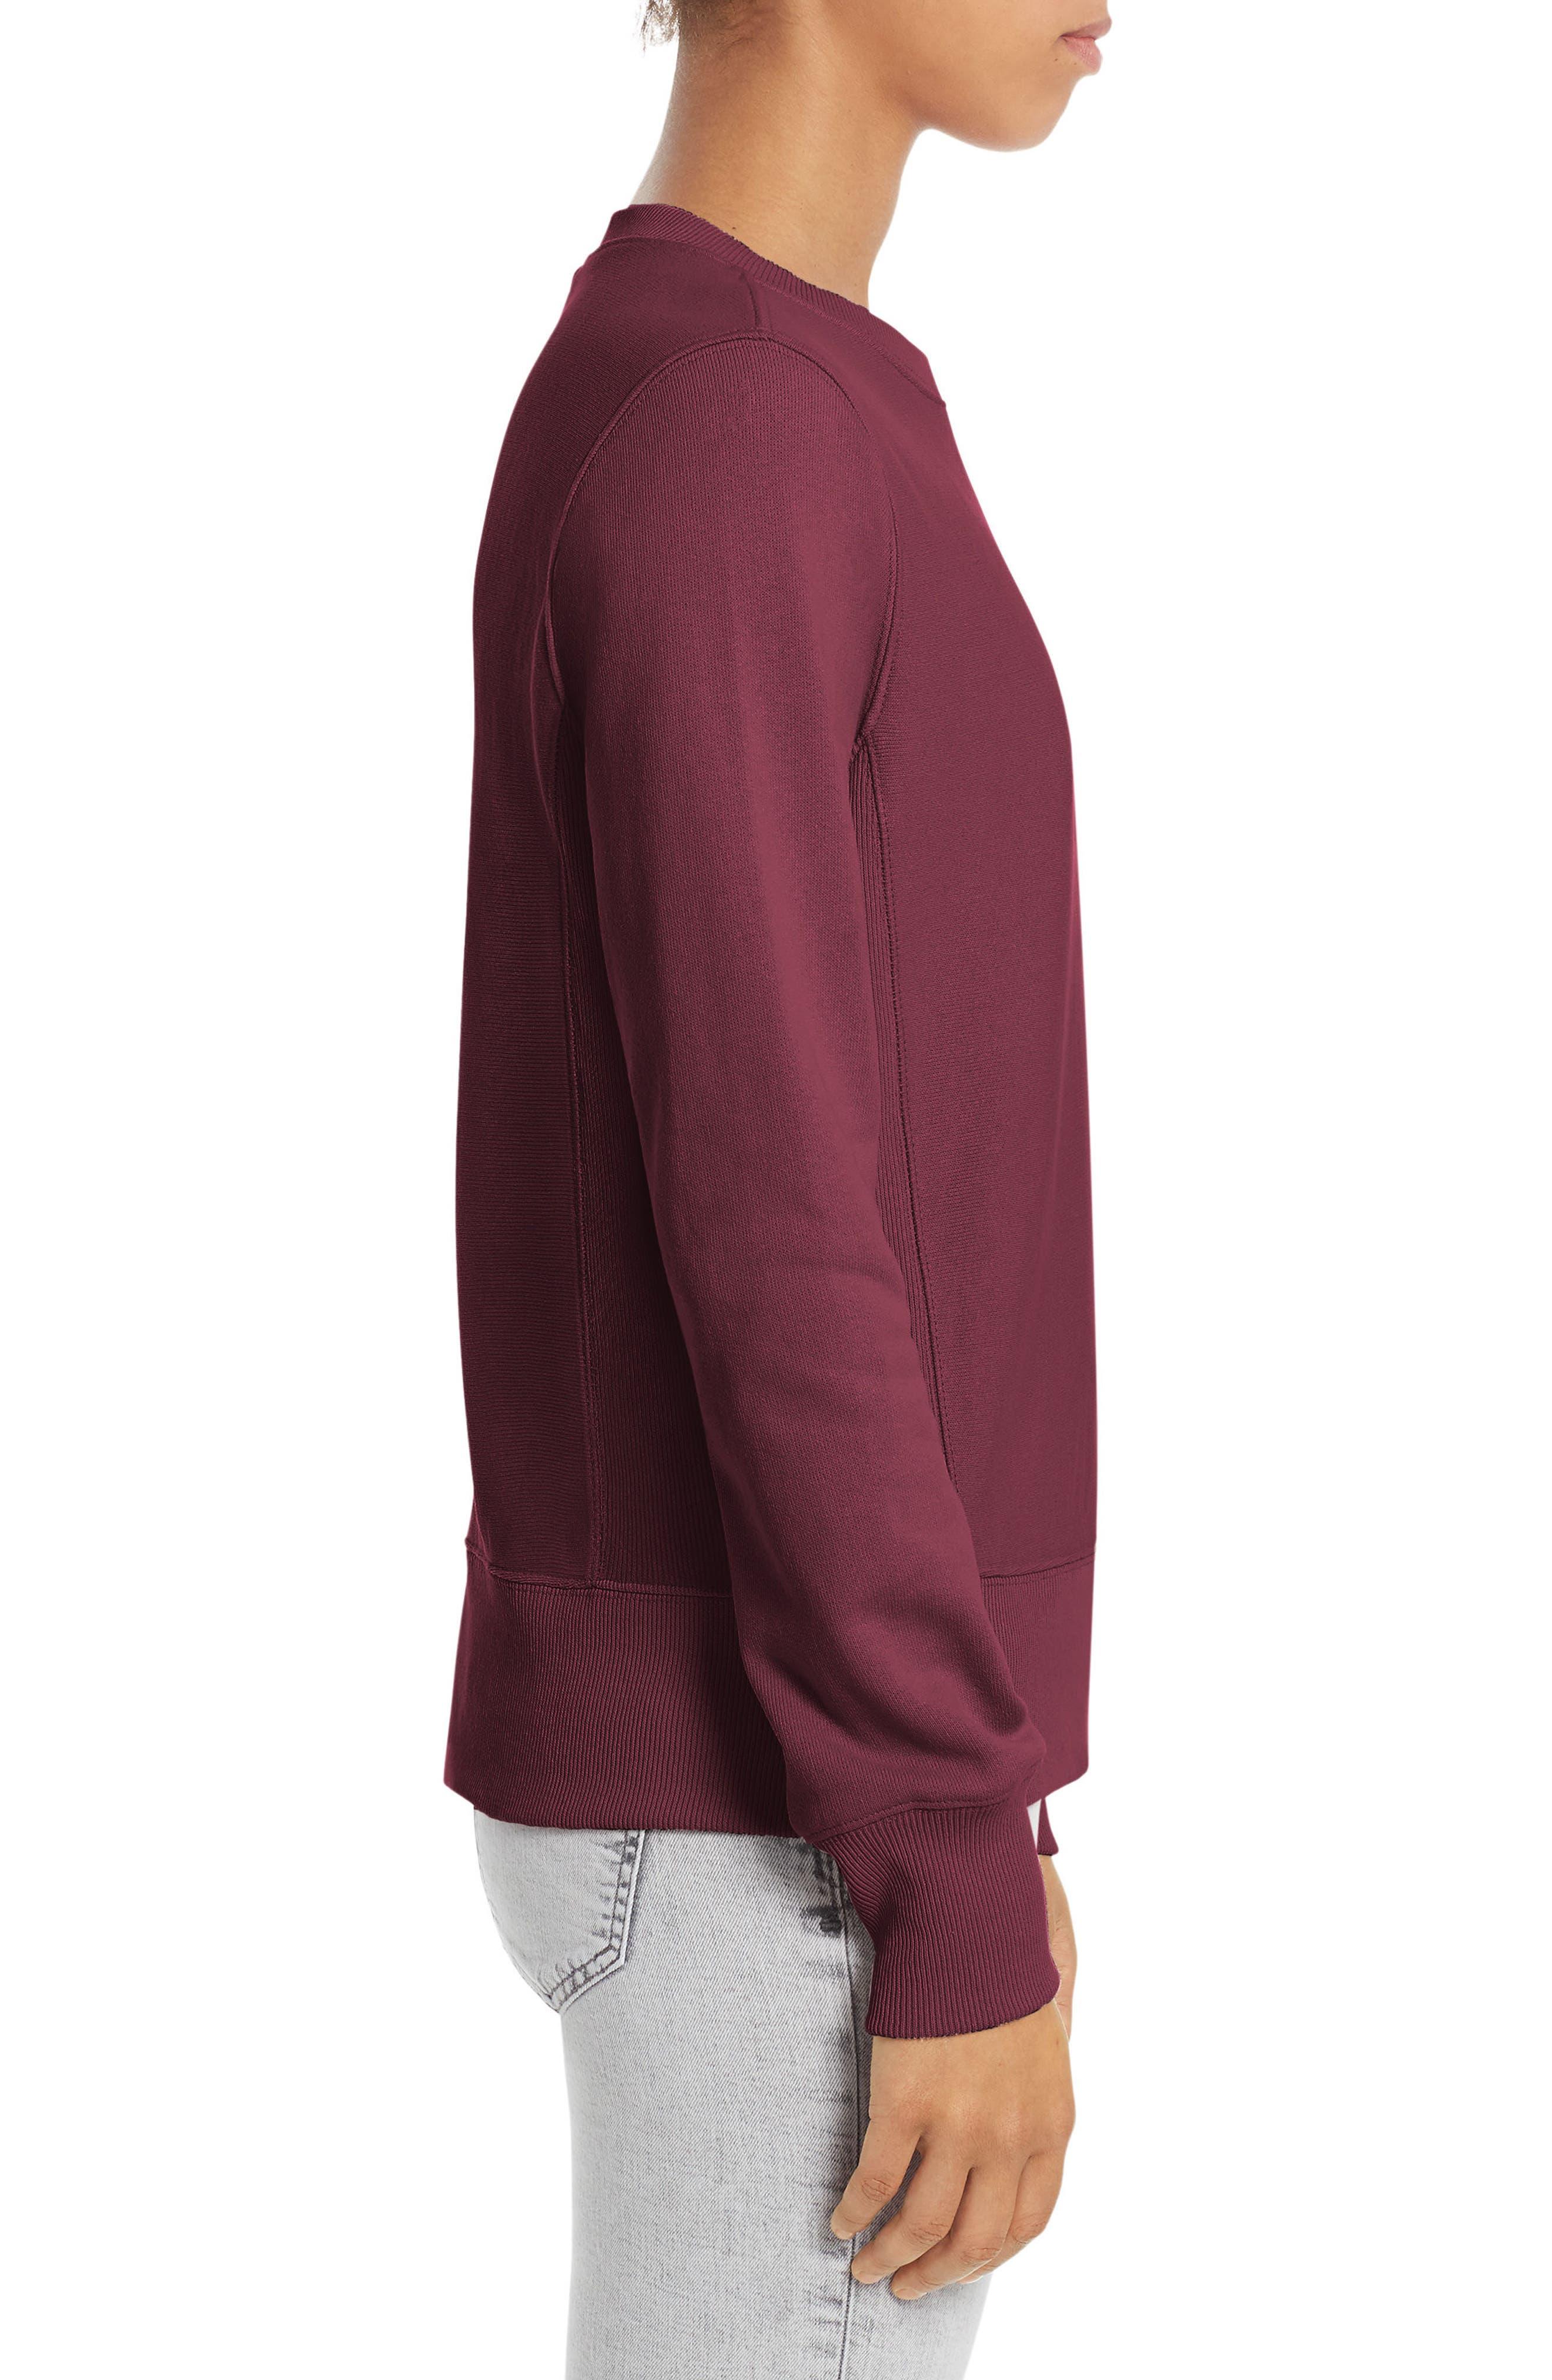 Reverse Weave<sup>®</sup> French Terry Crewneck Sweatshirt,                             Alternate thumbnail 3, color,                             Bordeaux Red